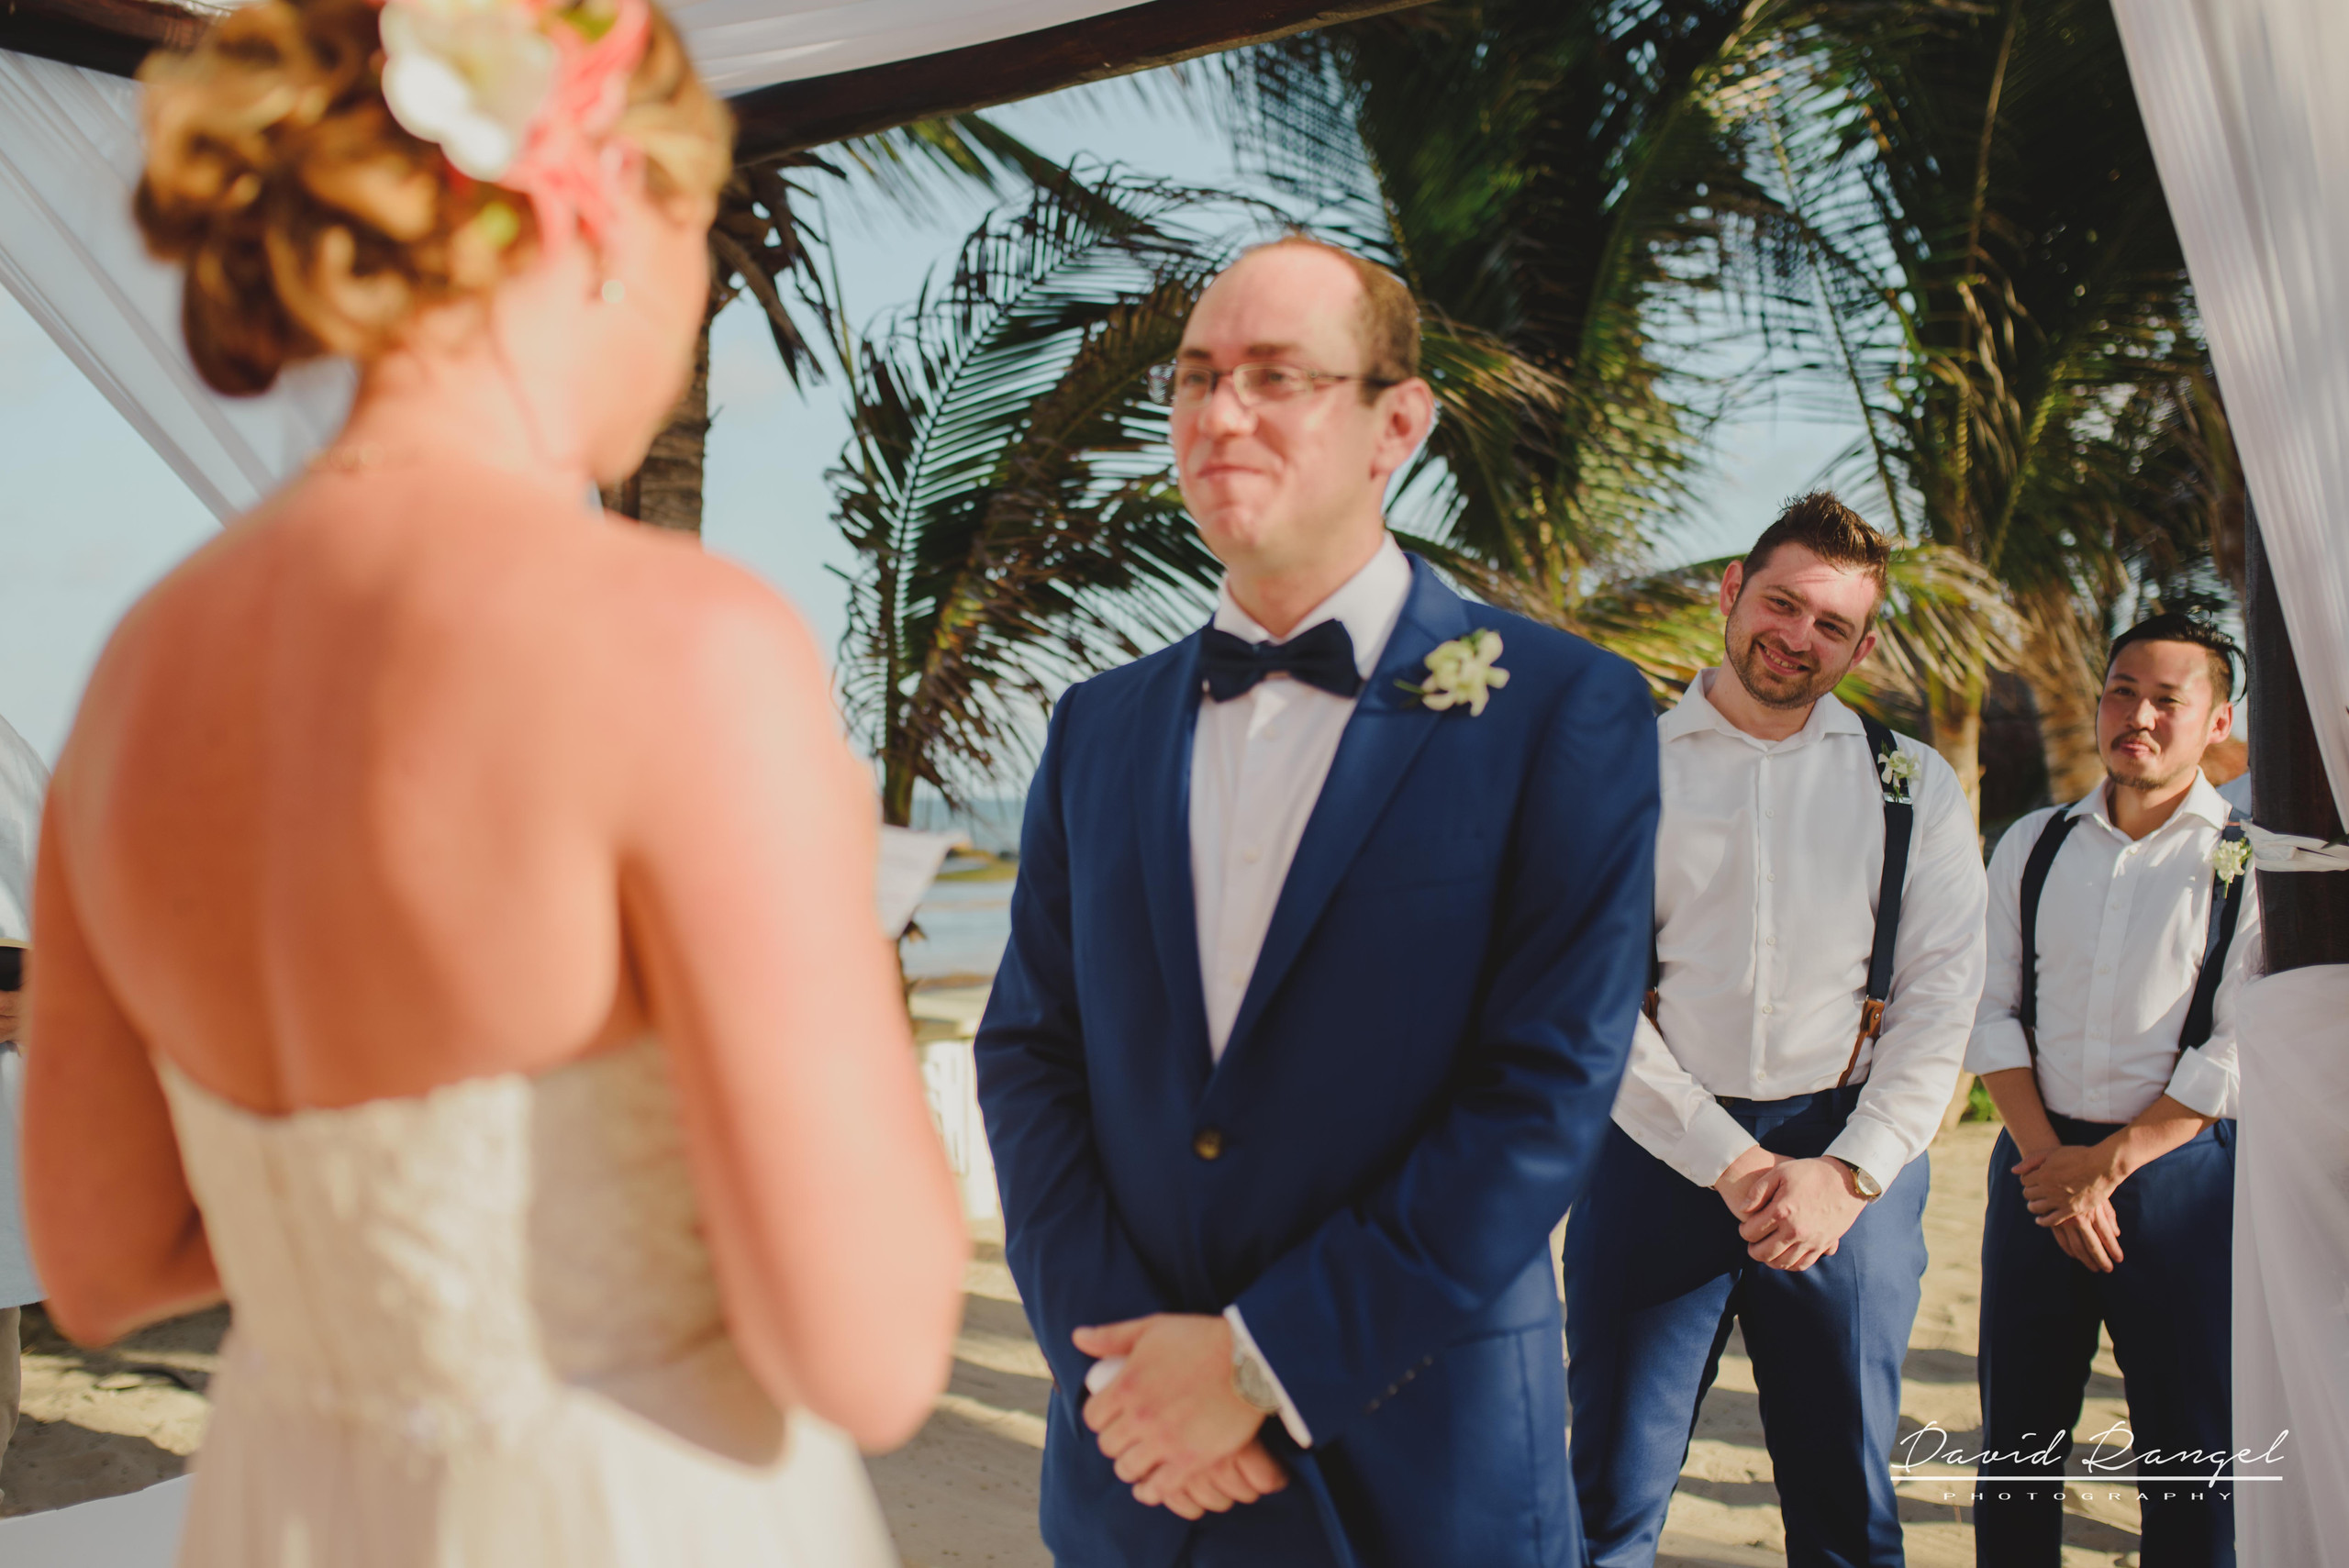 wedding+gazebo+beach+ceremony+photo+groom+bride+bridal+party